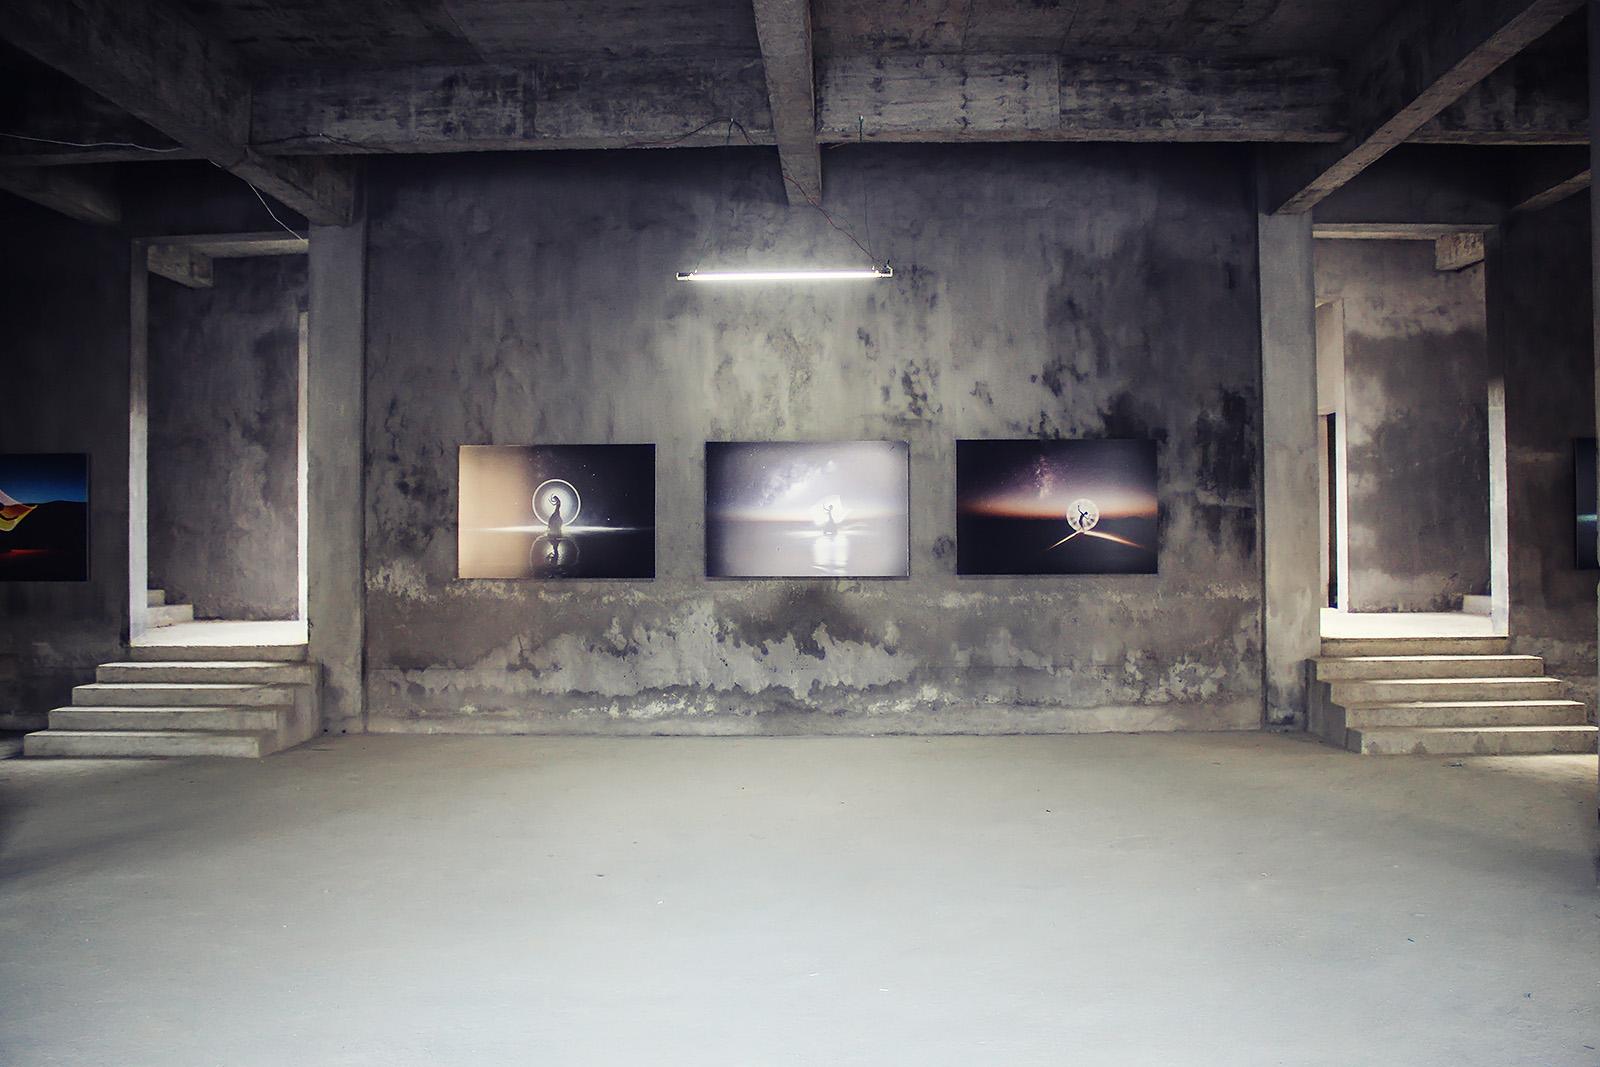 light-painting-exhibition-china-eric-pare-kim-henry-huangshan-international-photography-festival-11th-yixian-2-jpg-8m4a.jpg